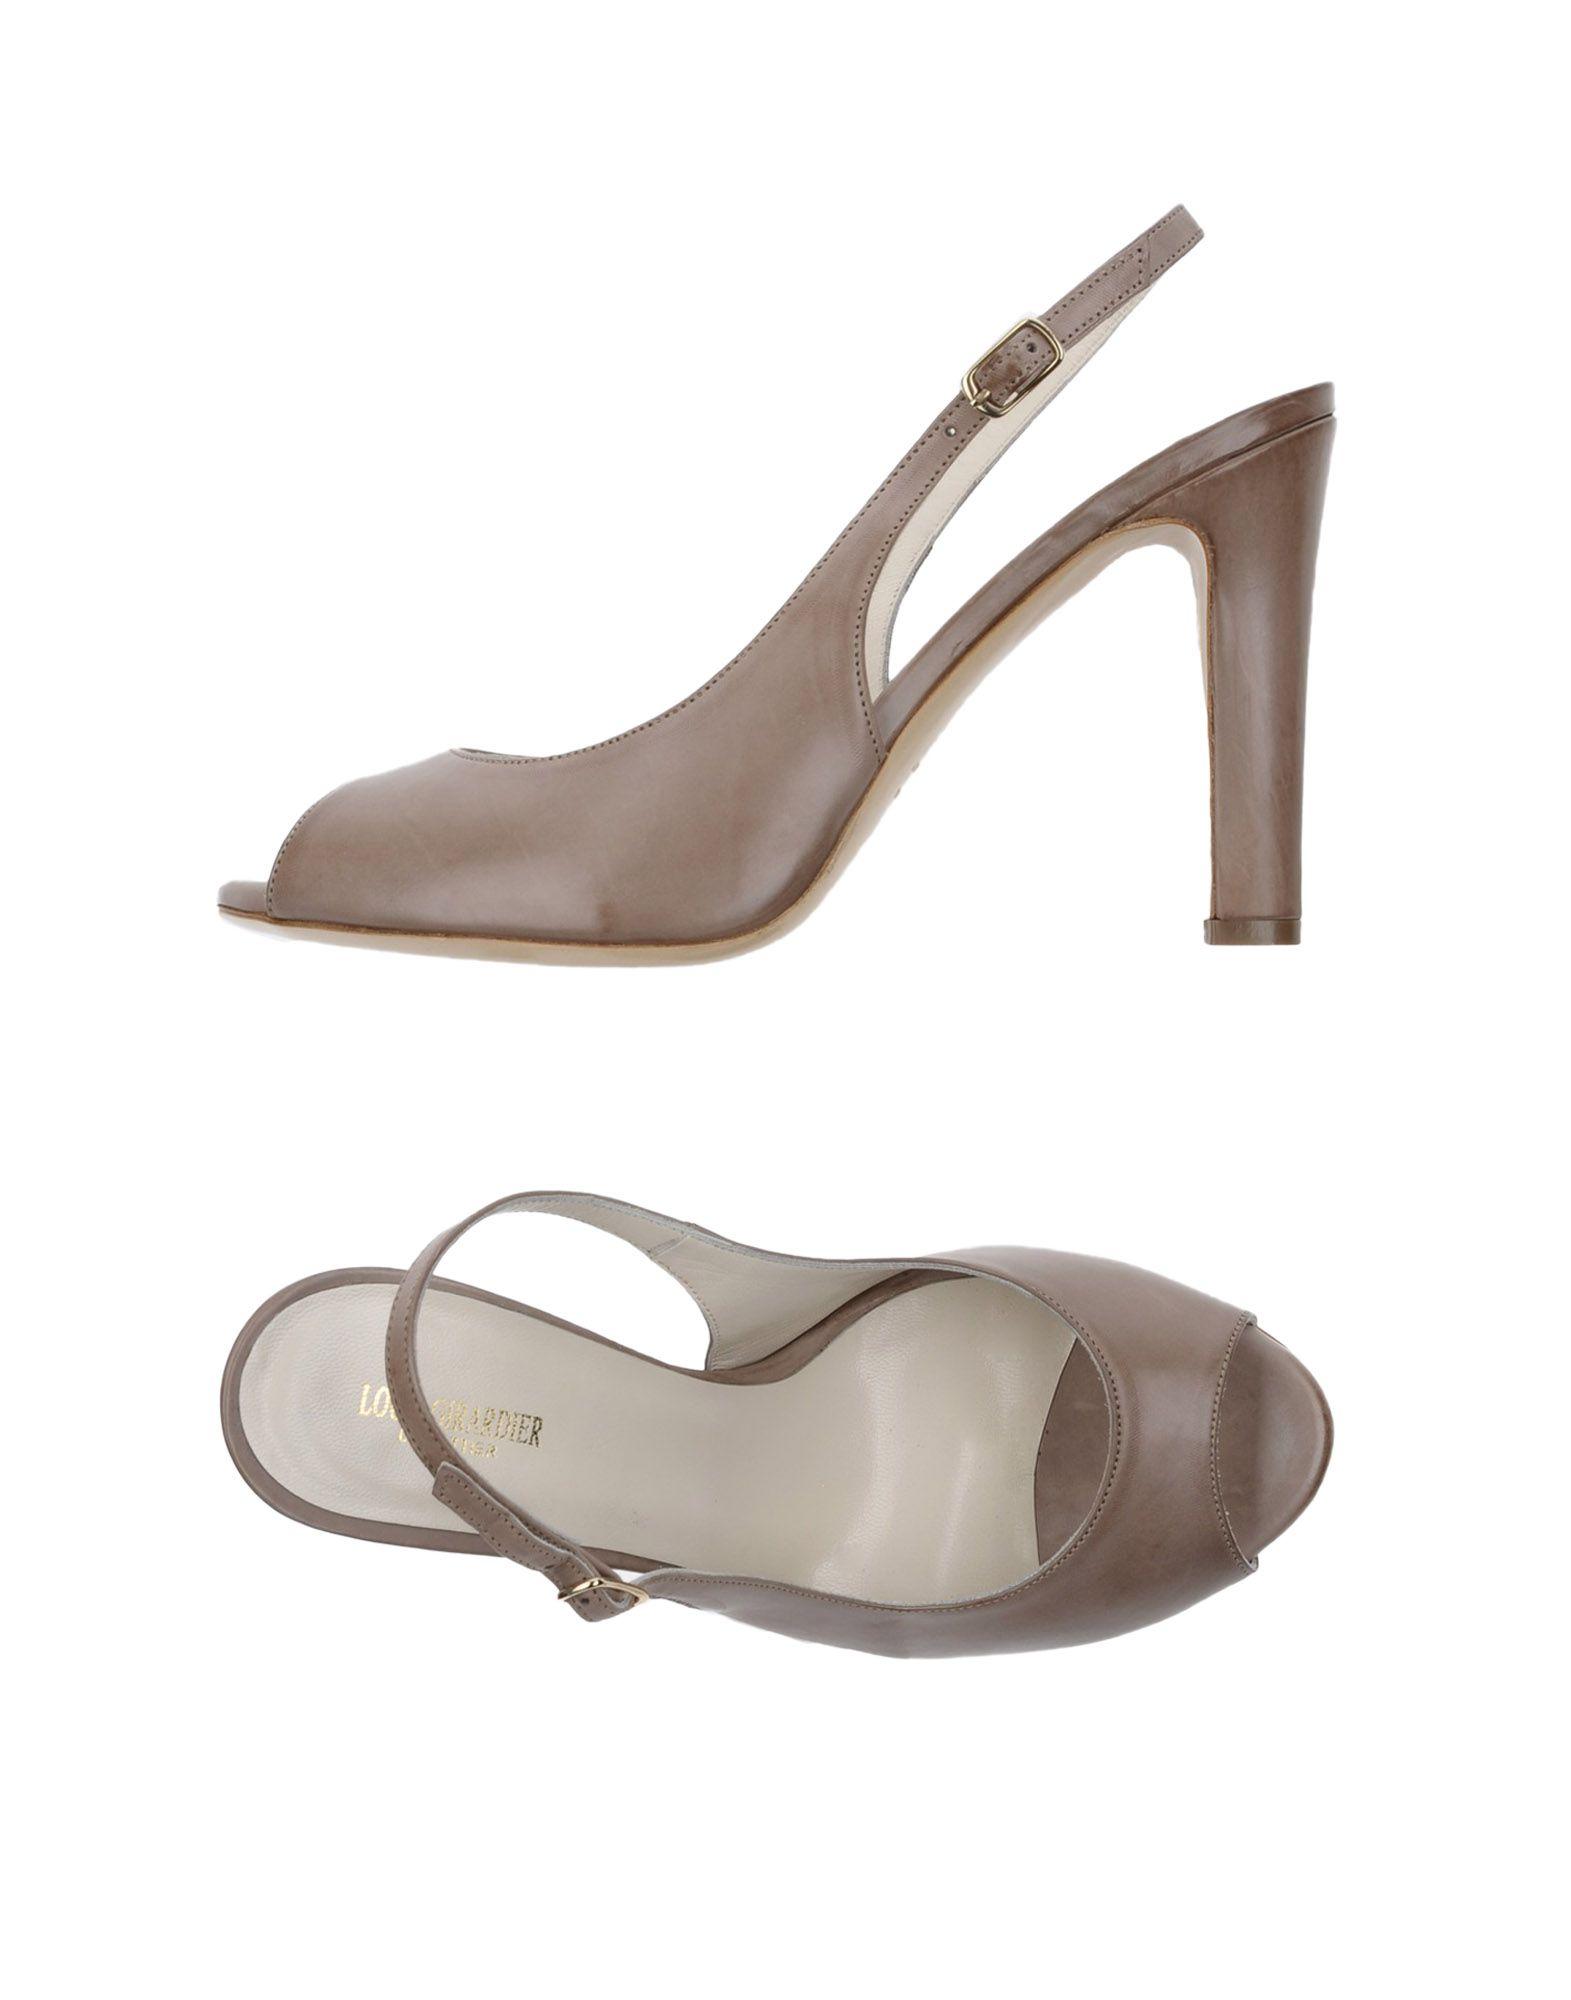 FOOTWEAR - Sandals LOUIS GERARDIER LE BOTTIER NTiB39aXX